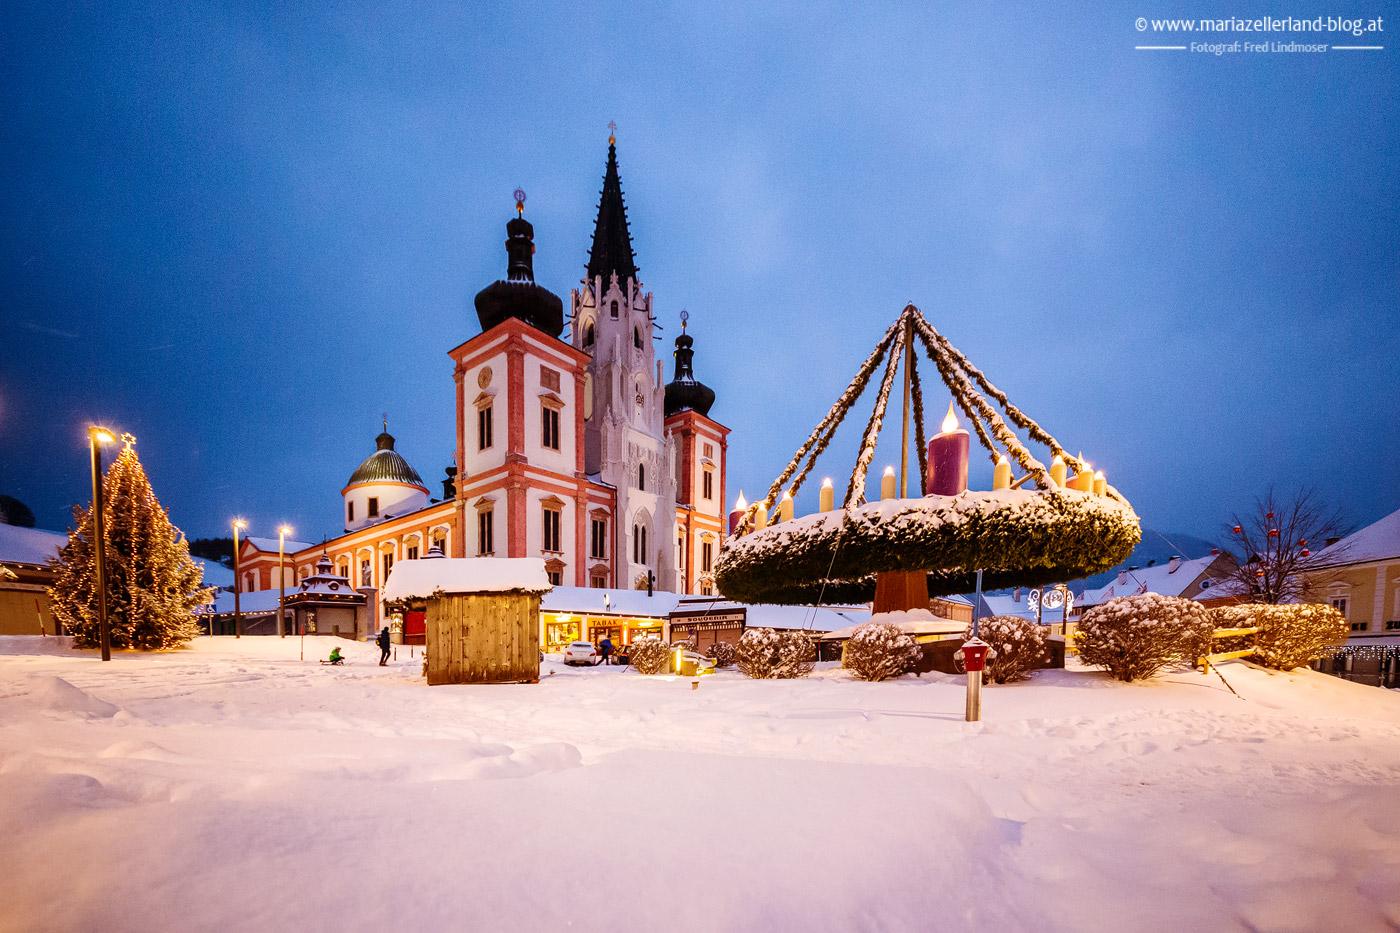 Mariazell-Schnee-Winter-Basilika-_2014_0704